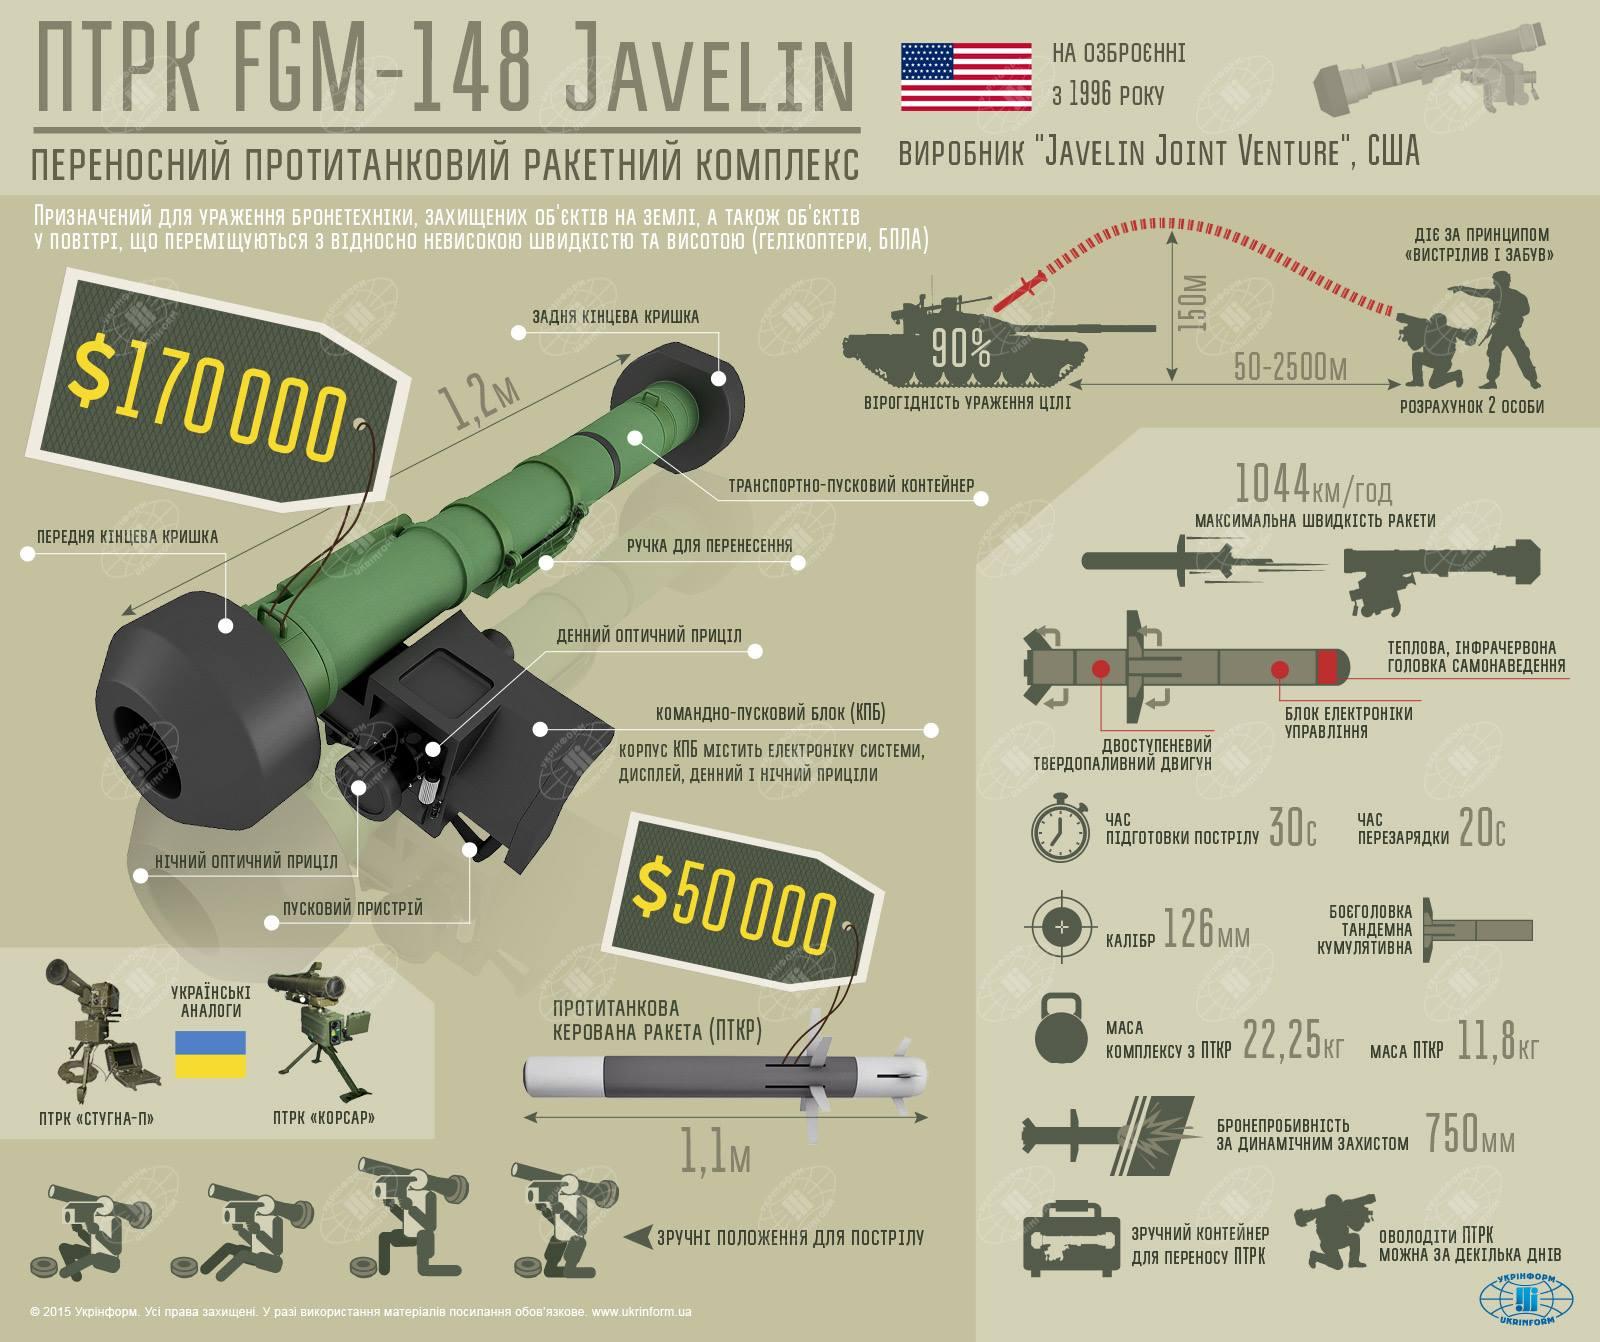 Протитанкові комплекси Javelin